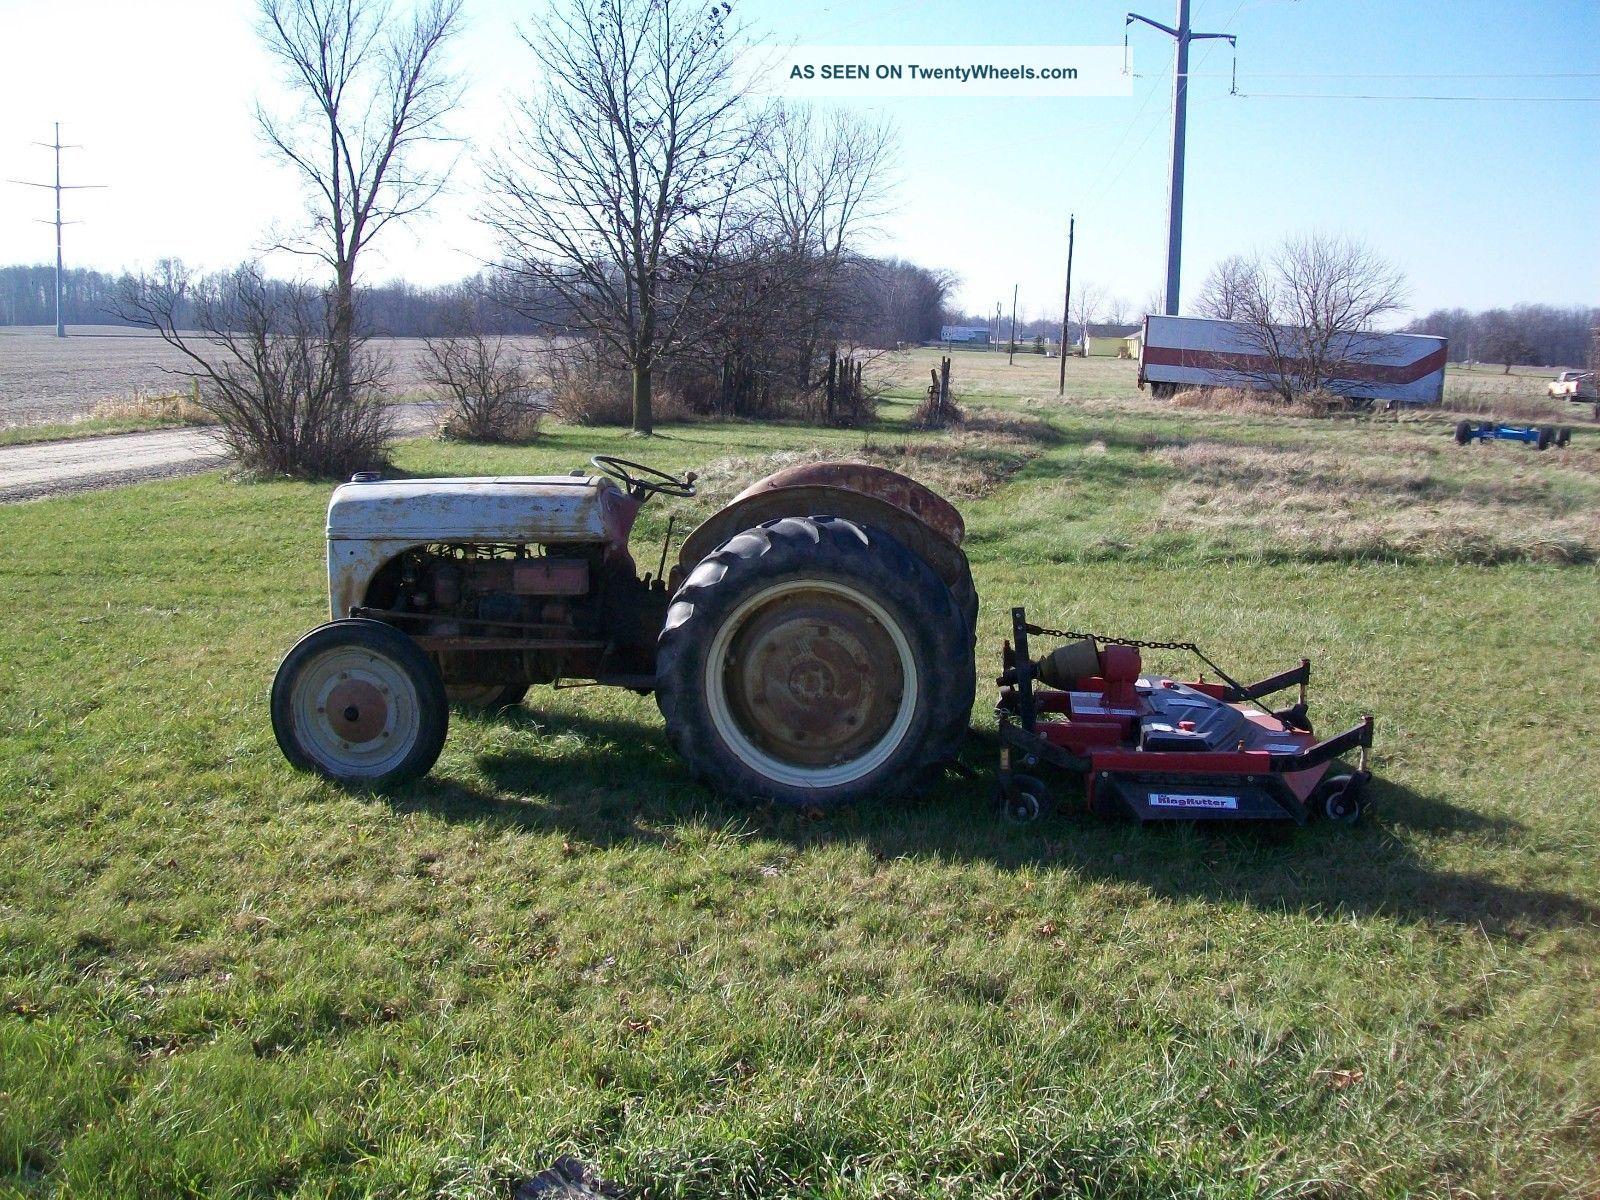 Antique ford tractors pictures Antique Tractors Photo Gallery - Pictures of Antique Tractors